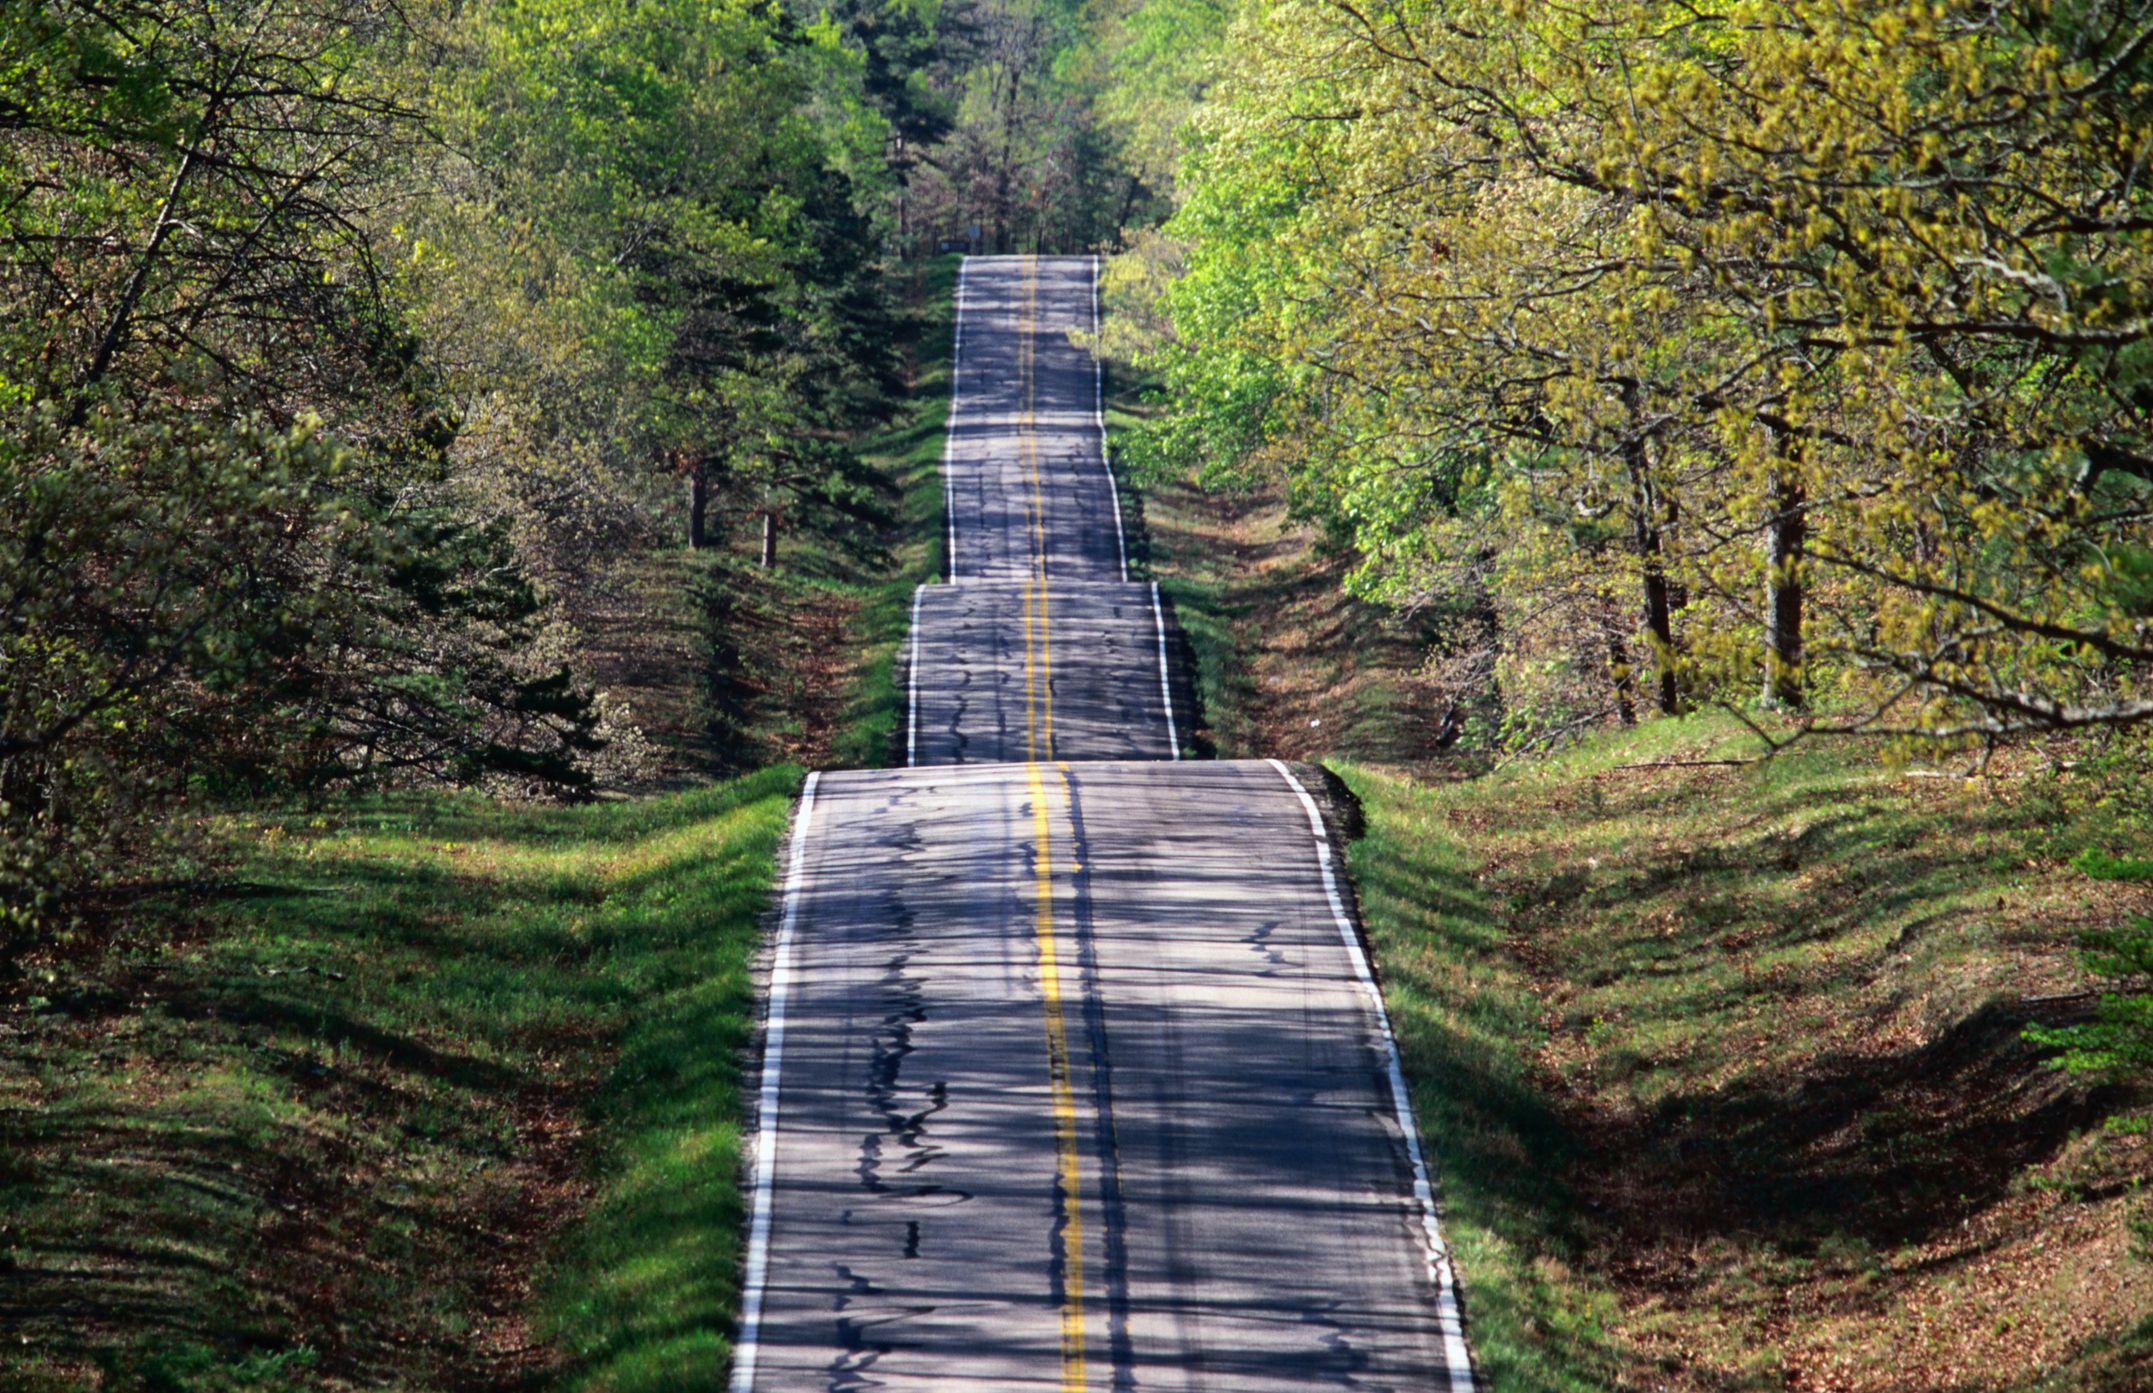 Highway 19 through Mark Twain National Forest in Missouri